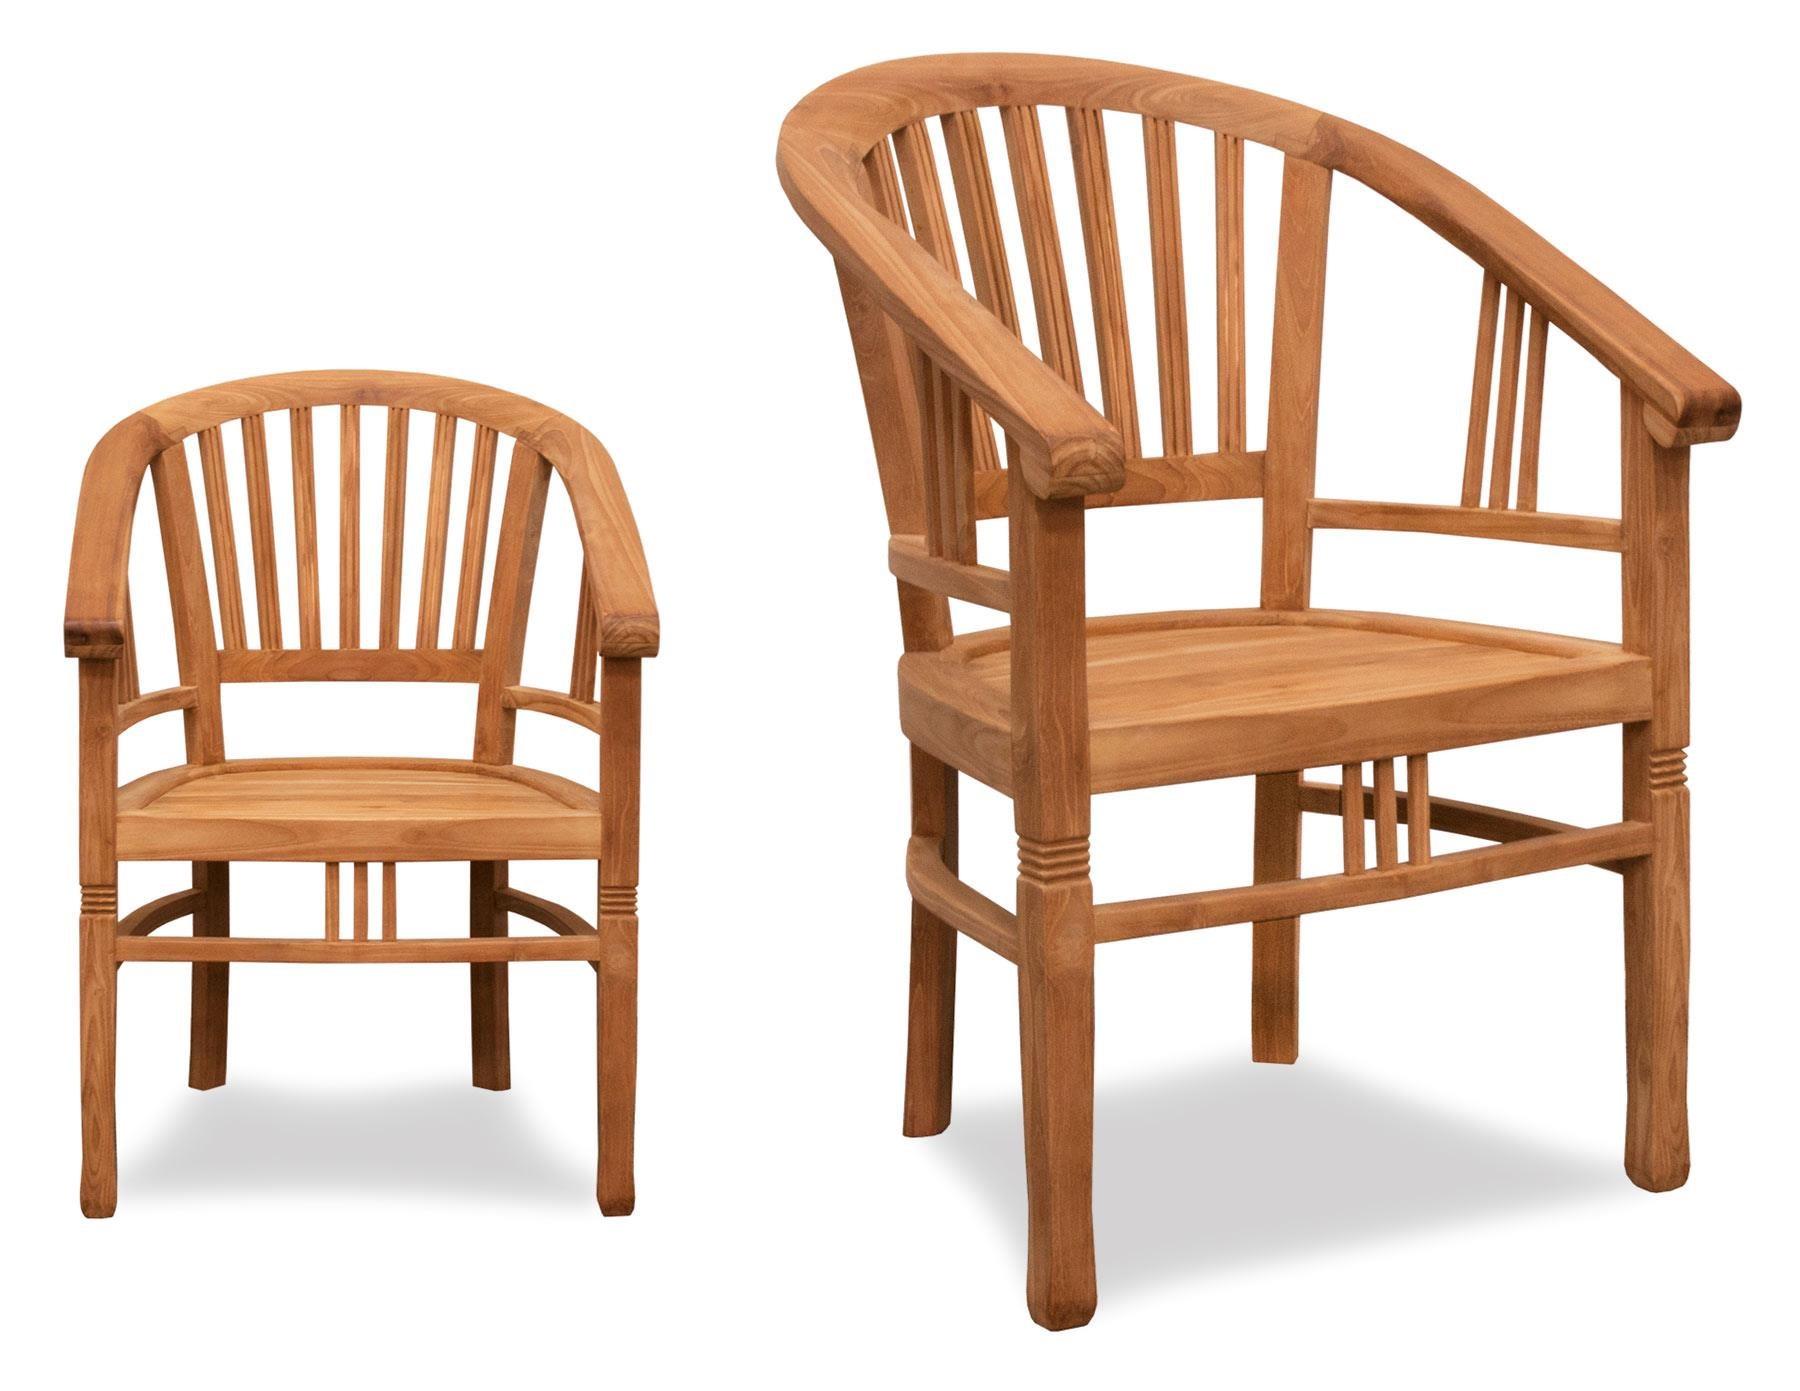 BeachCraft Bali Teak Dining/Game Chair - Item Number: GC9870